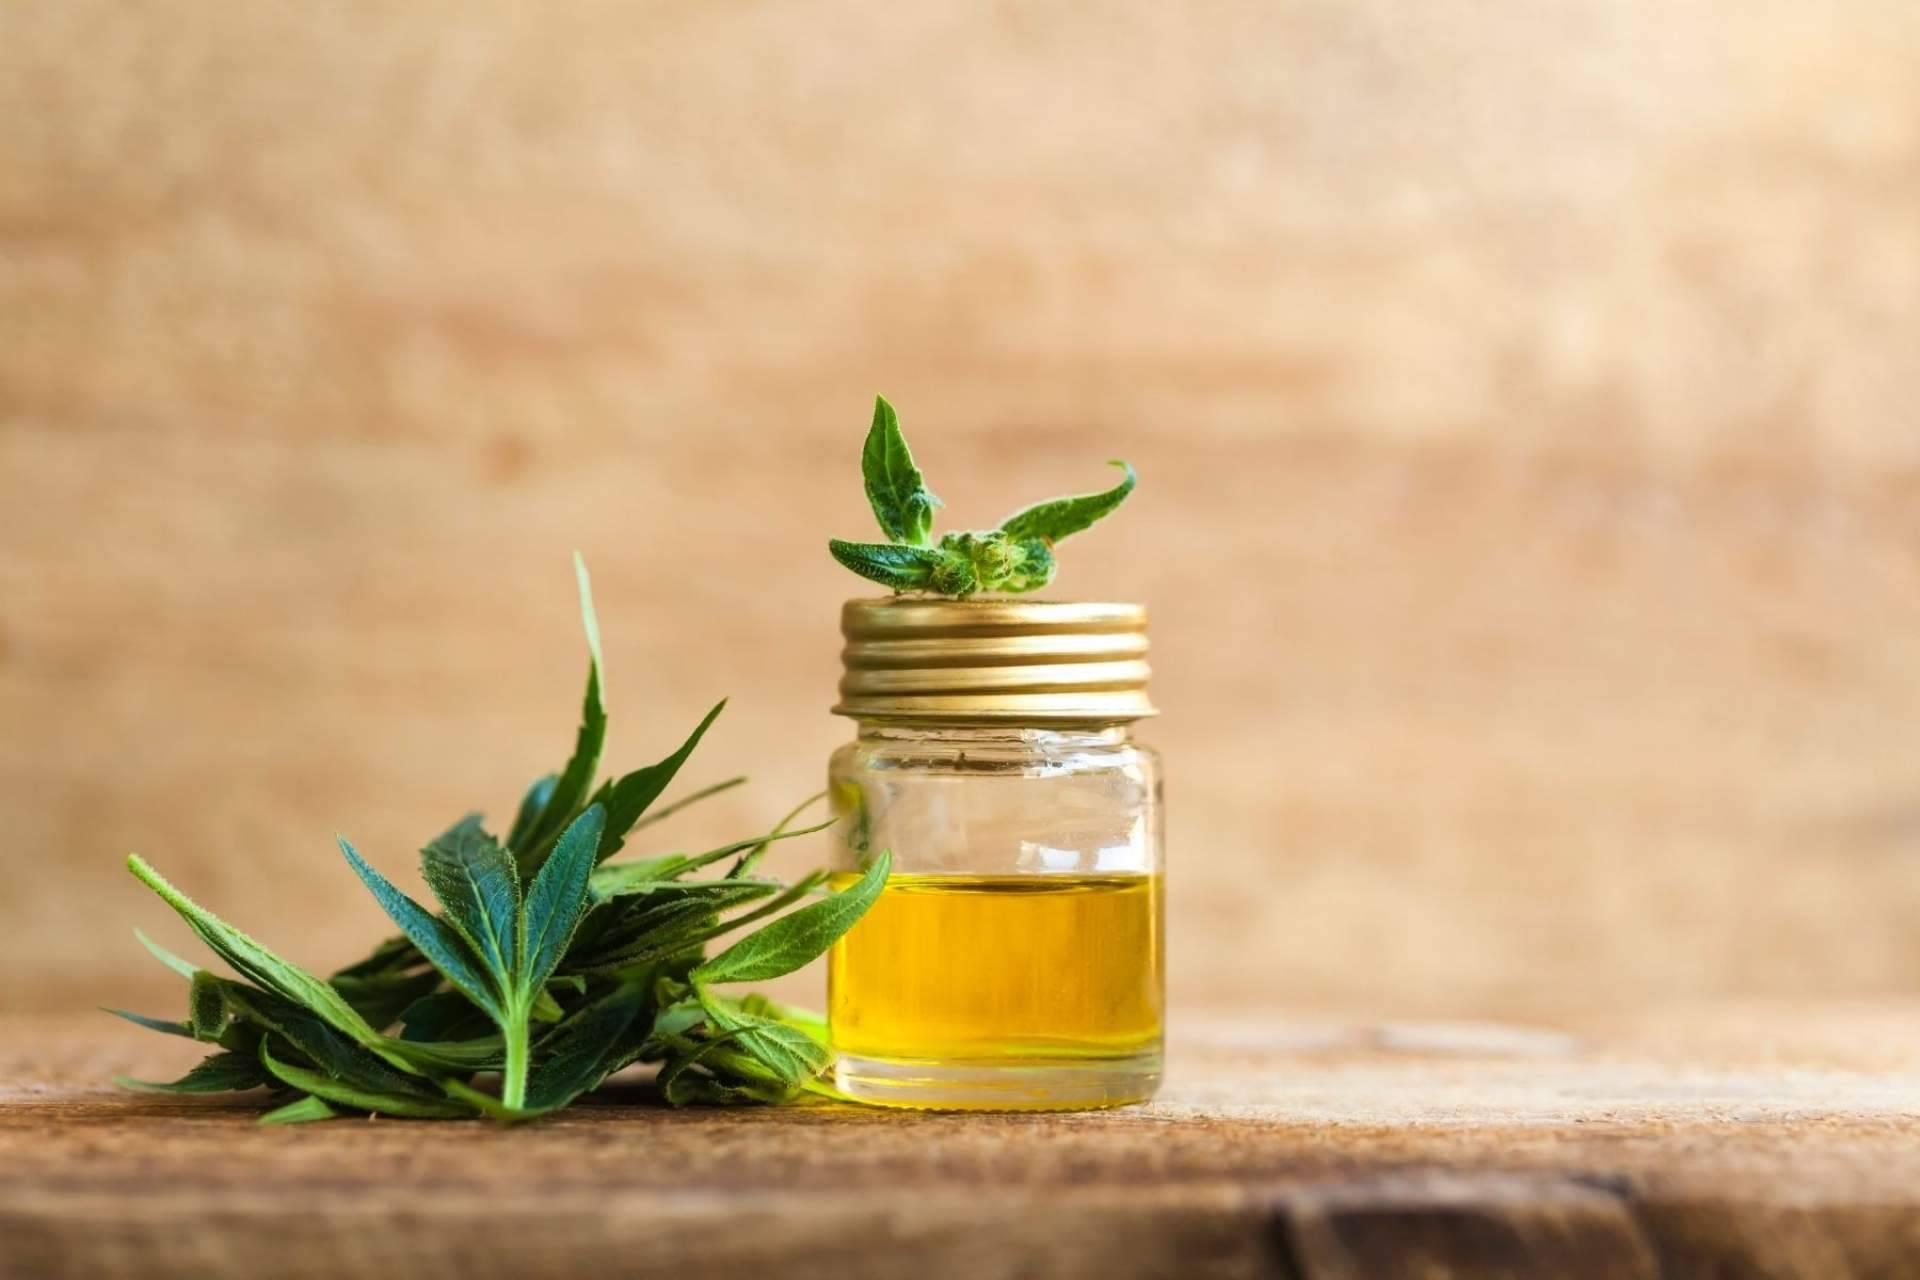 Premium Legal Hemp: ¿El aceite CBD para tratar molestias musculares funciona?